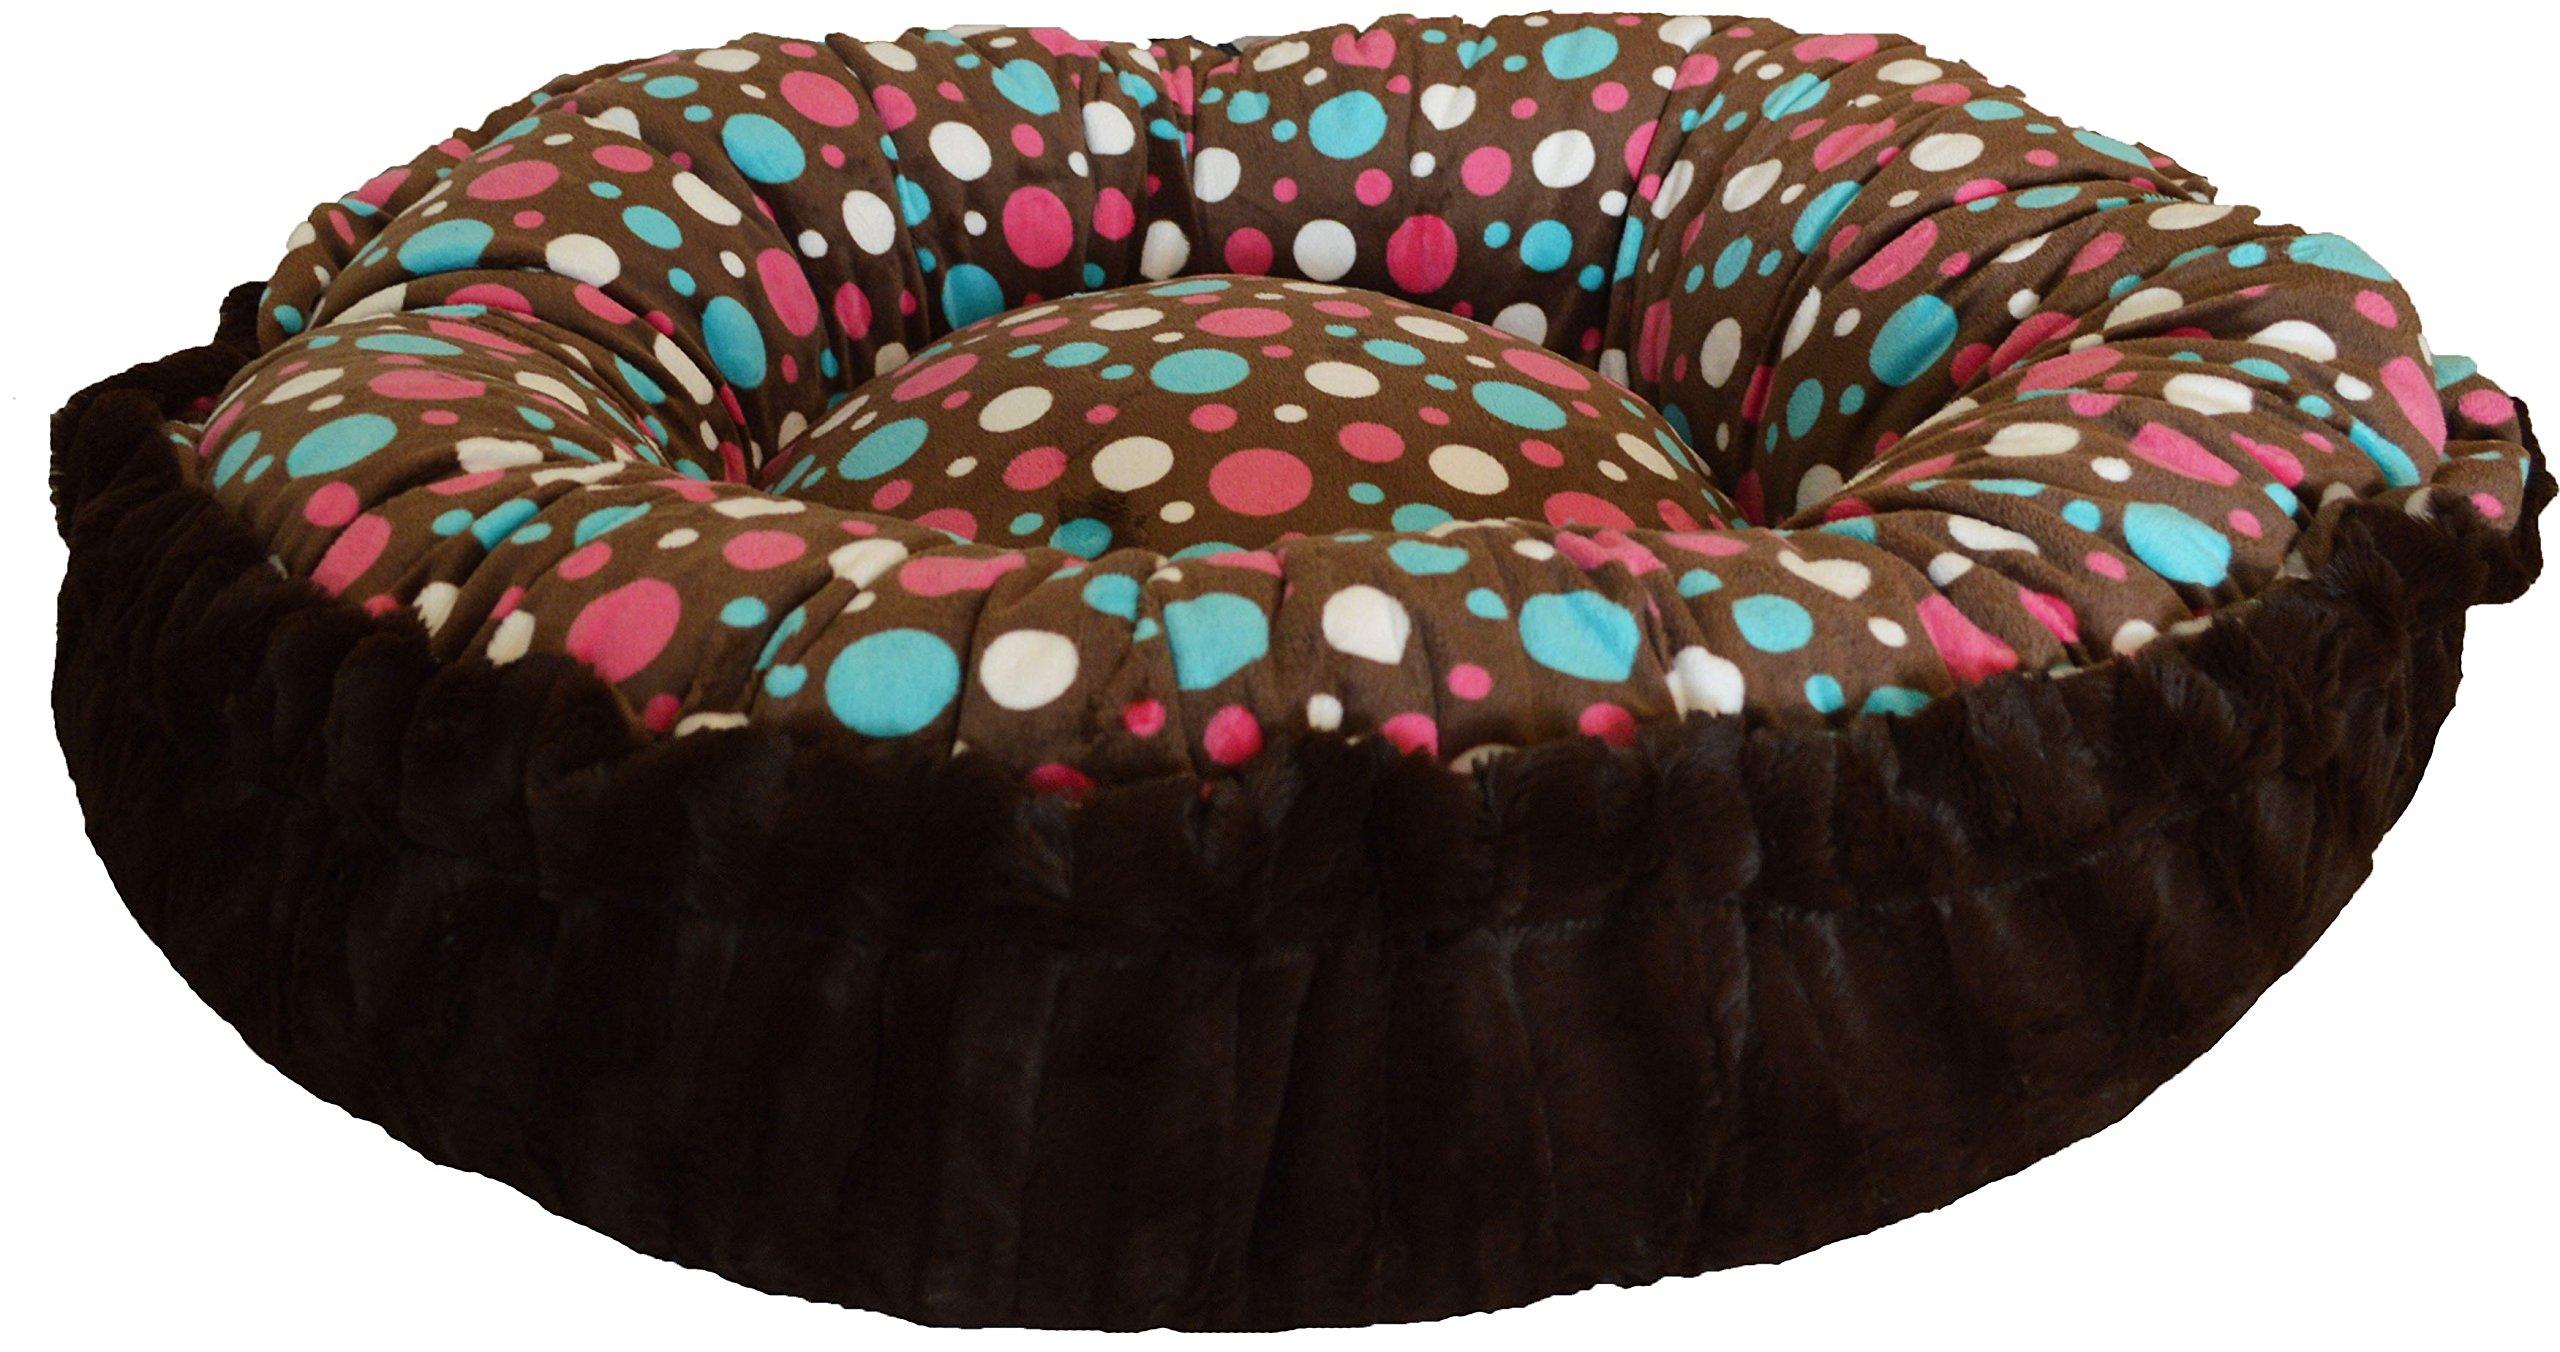 BESSIE AND BARNIE Godiva Brown/Cake Pop Luxury Shag Ultra Plush Faux Fur Bagelette Pet/Dog Bed (Multiple Sizes)